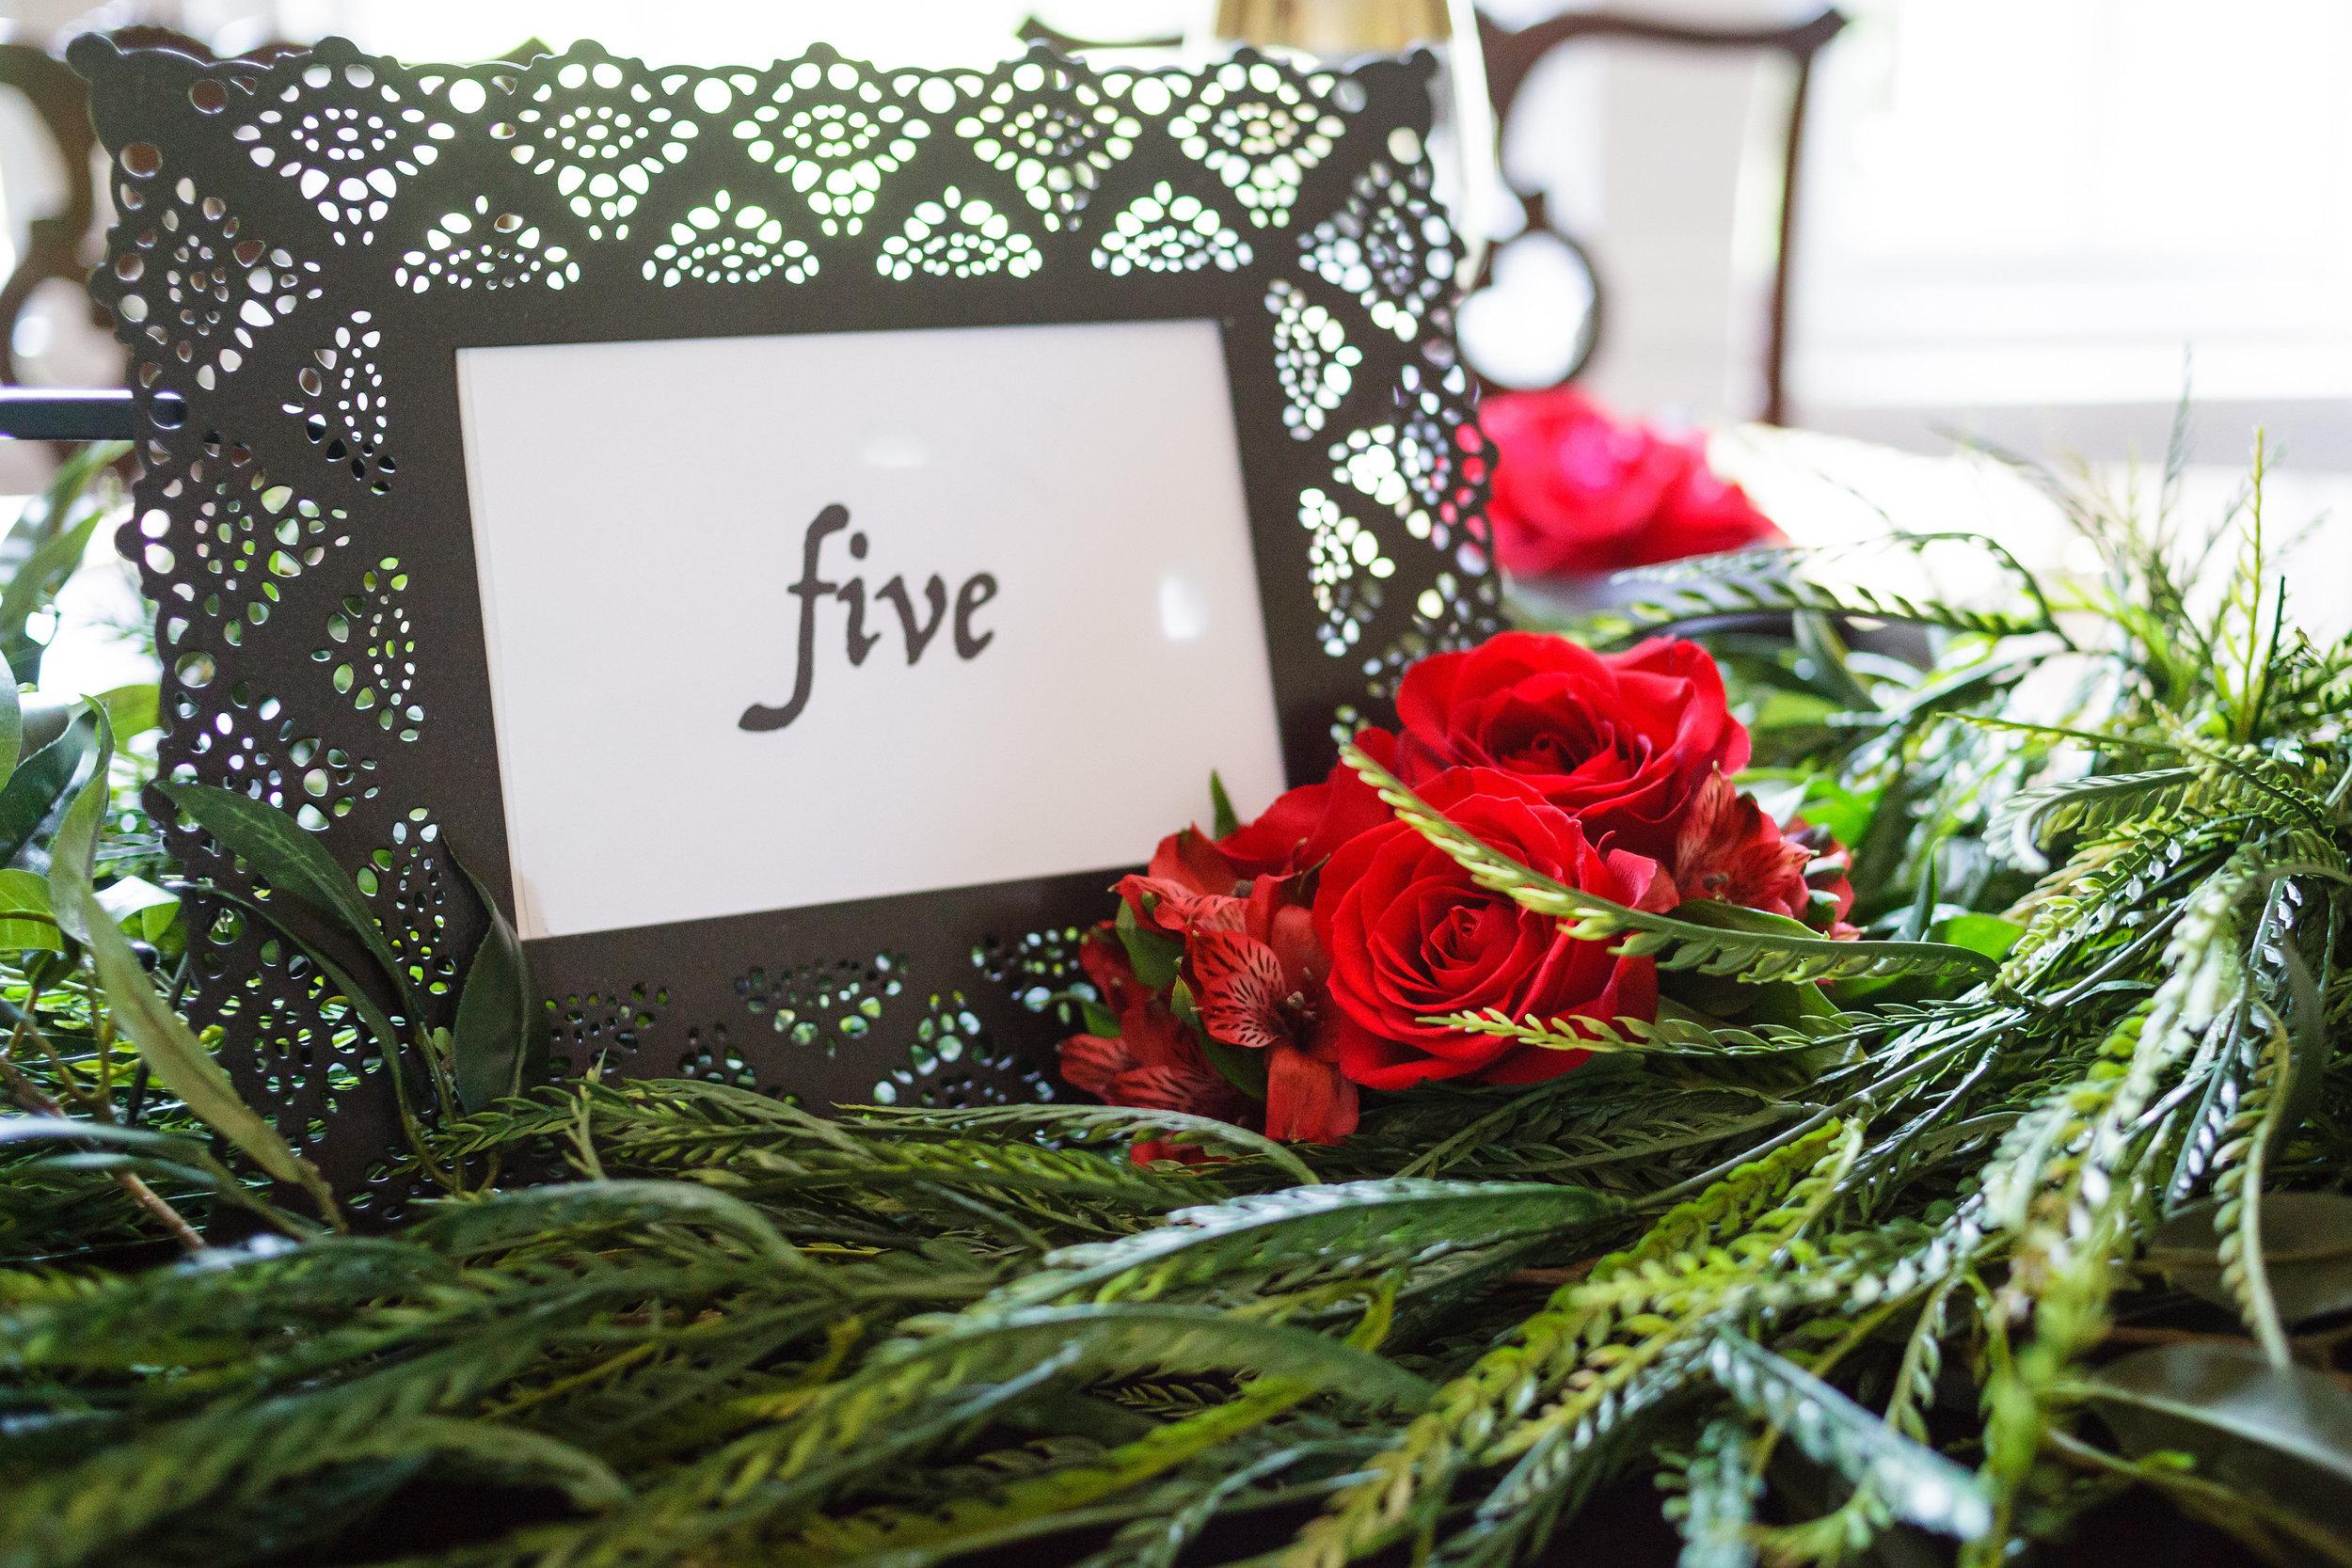 07 Spanish Rose Table Number Wedding Black Lace Red Rose Greenery Philadelphia Wedding Florist.jpg